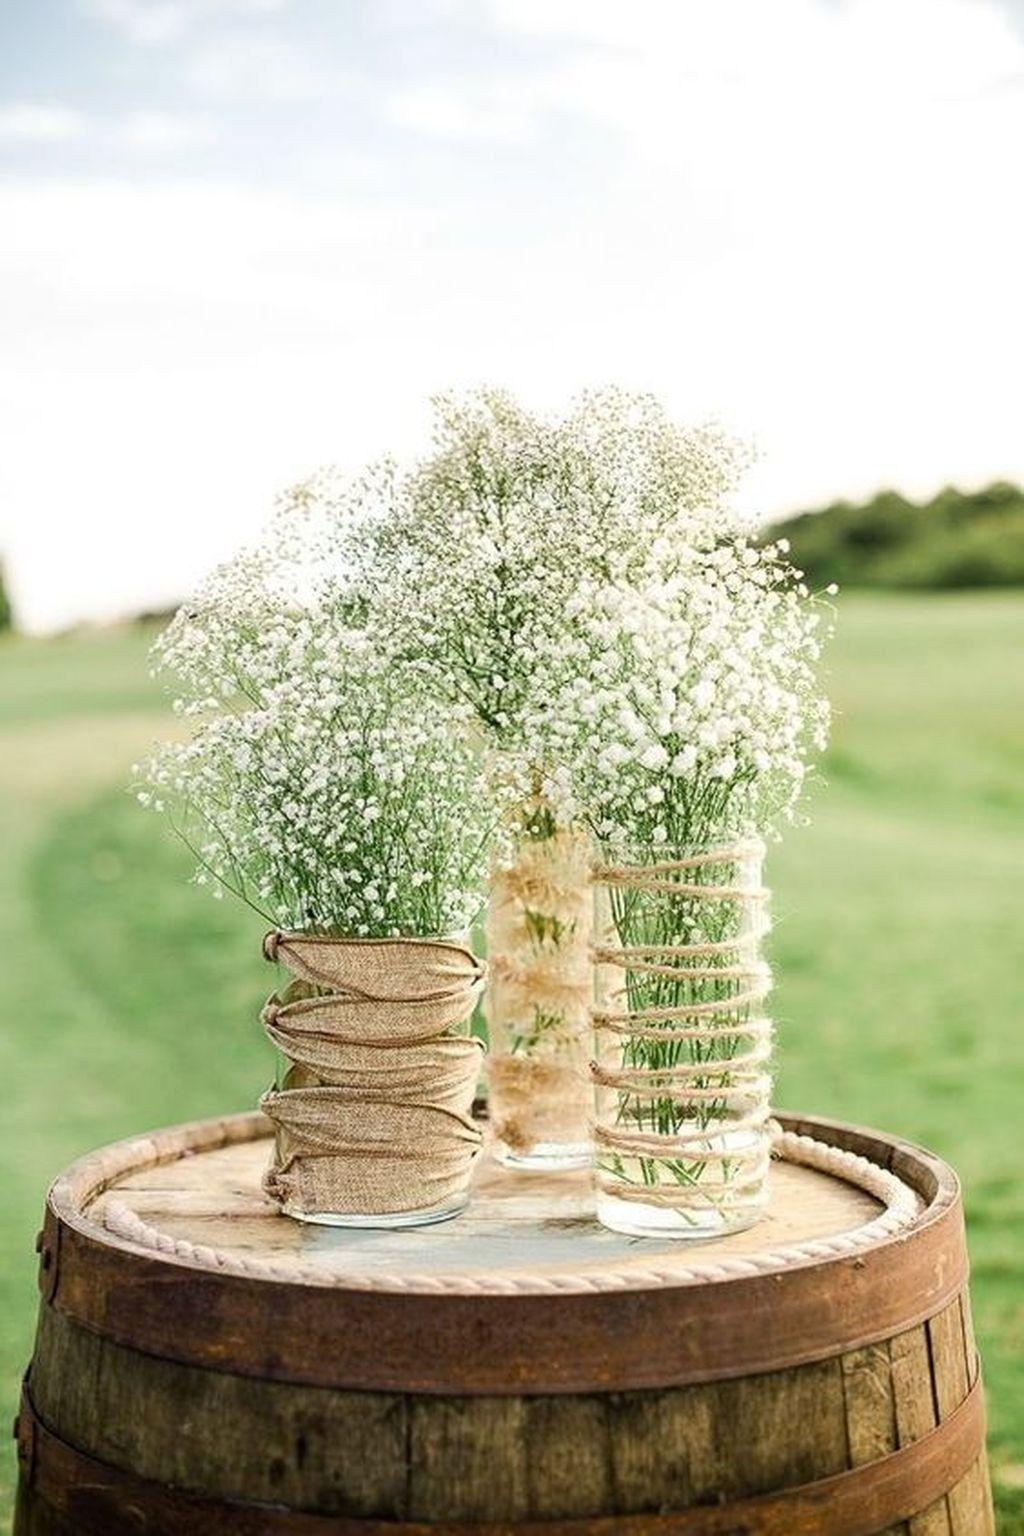 Inspiring rustic wedding decorations ideas on a budget 79 ...